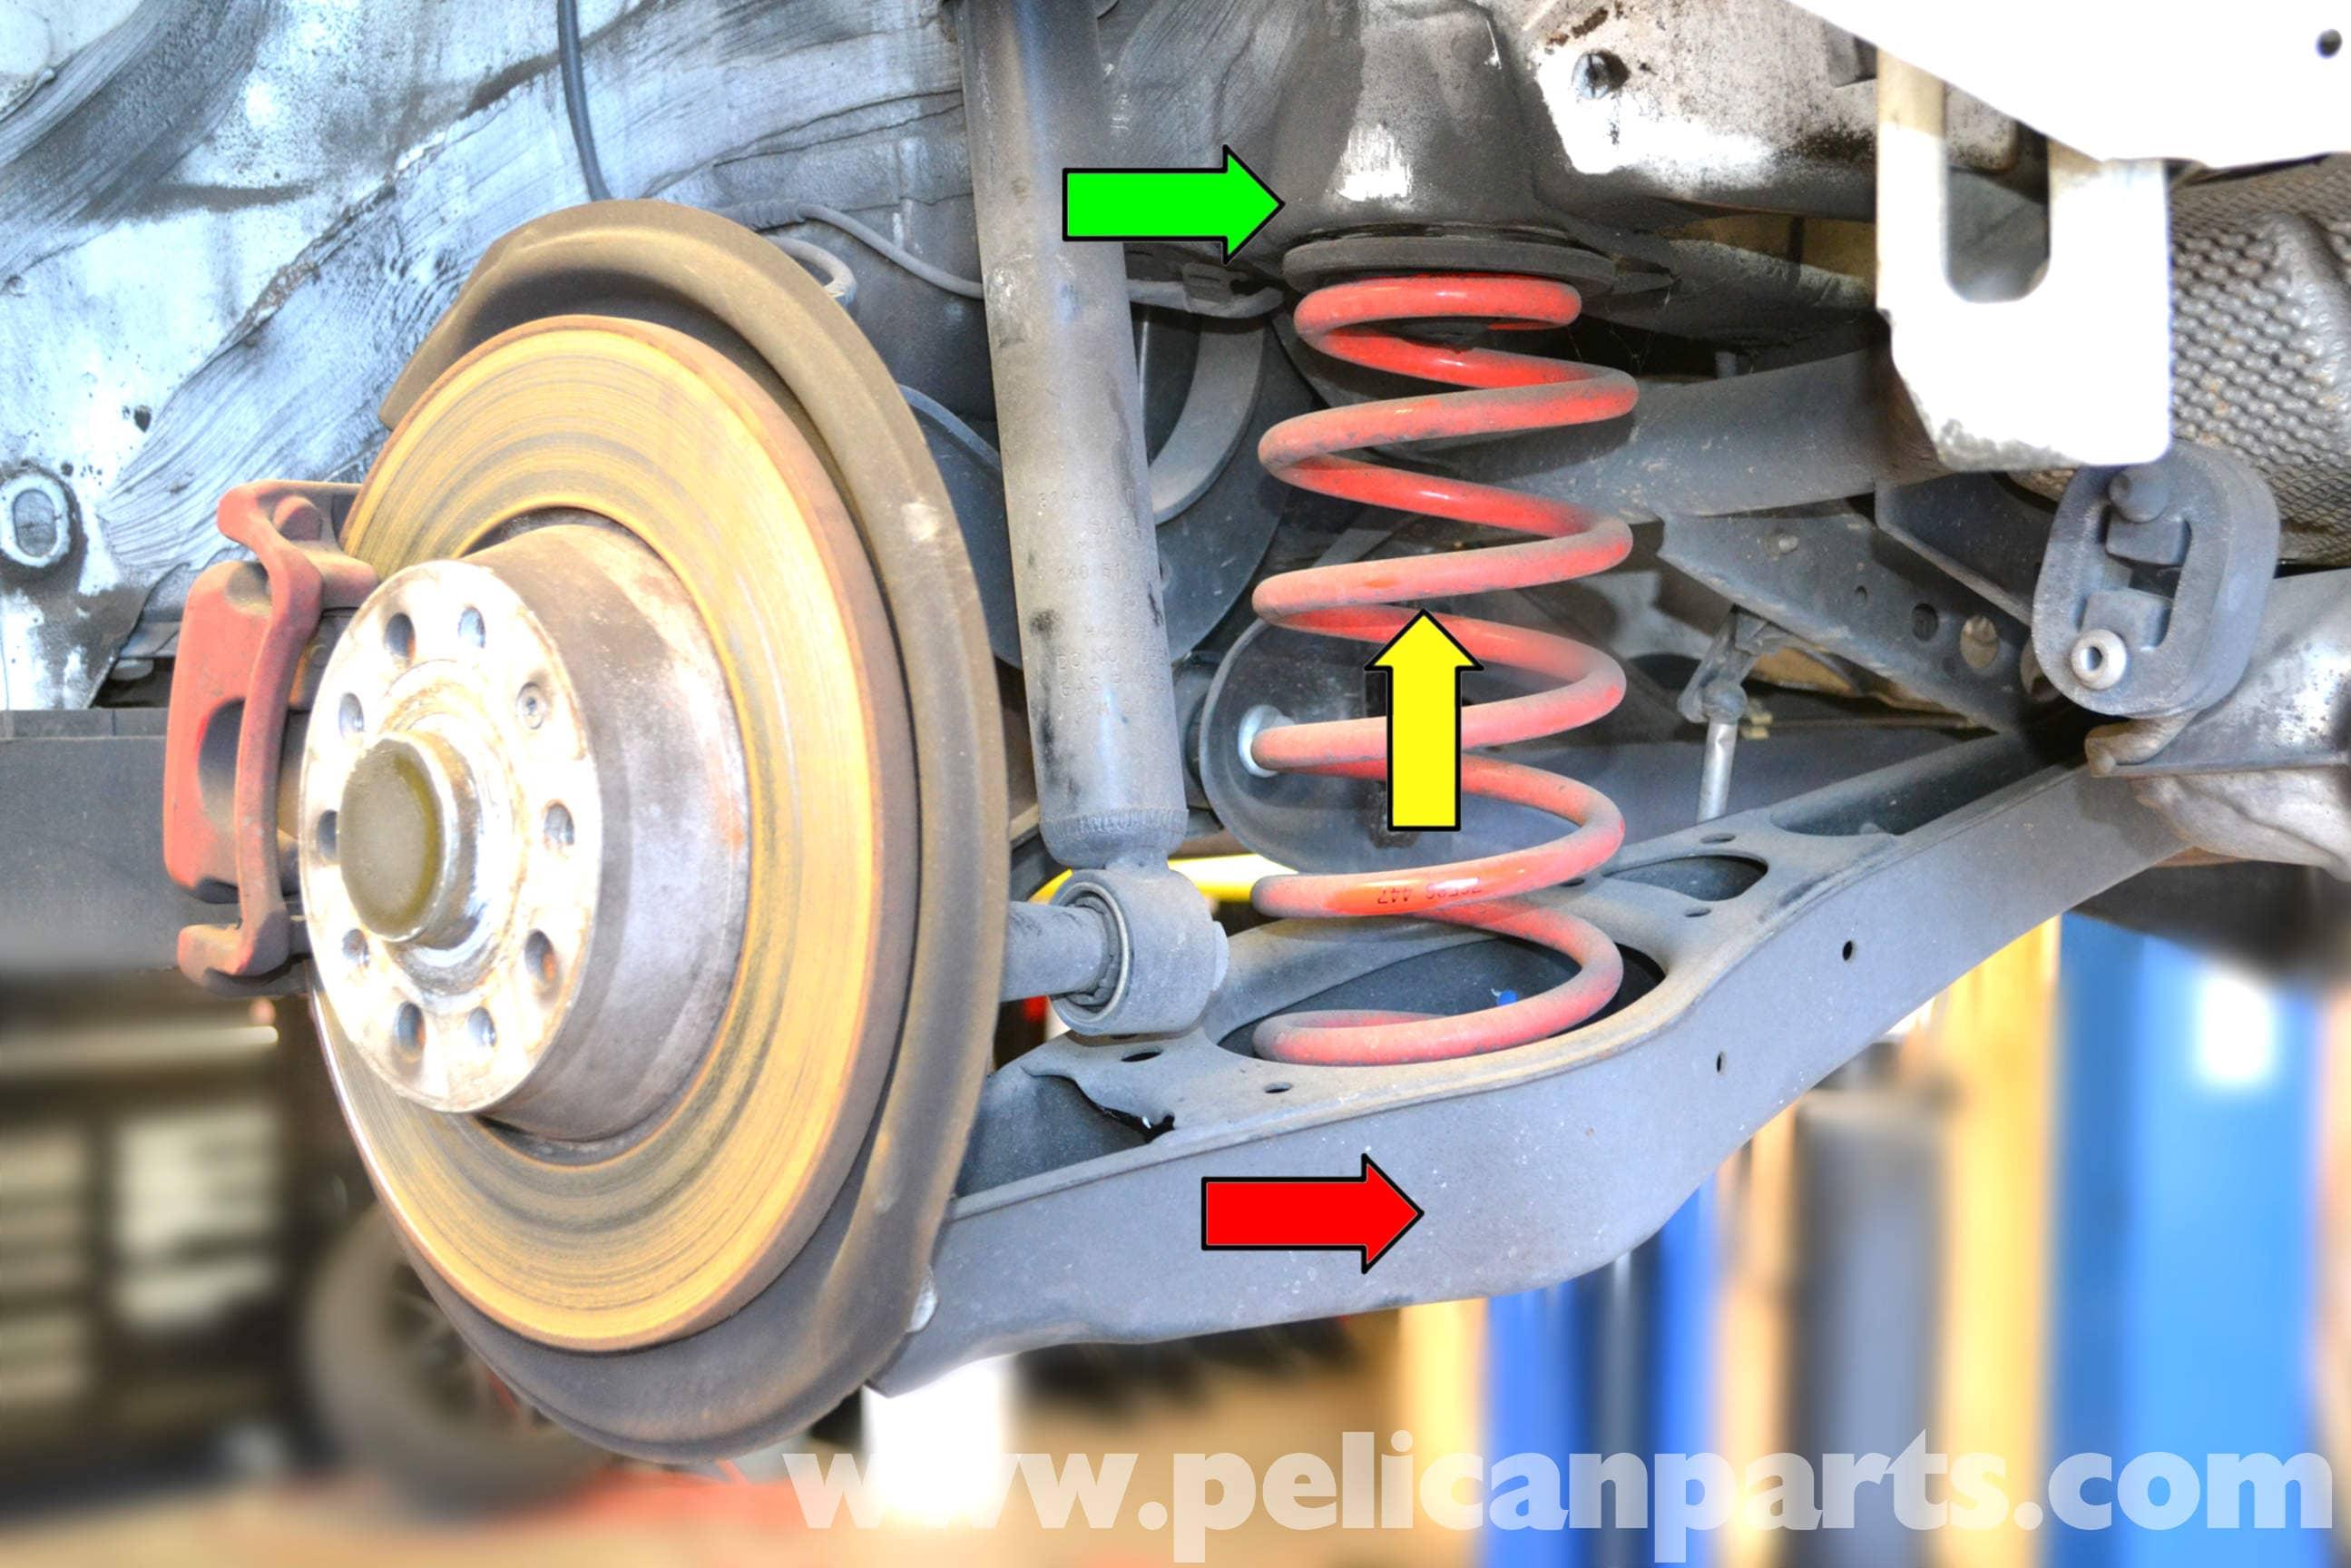 volkswagen golf gti mk  rear spring replacement   pelican parts diy maintenance article